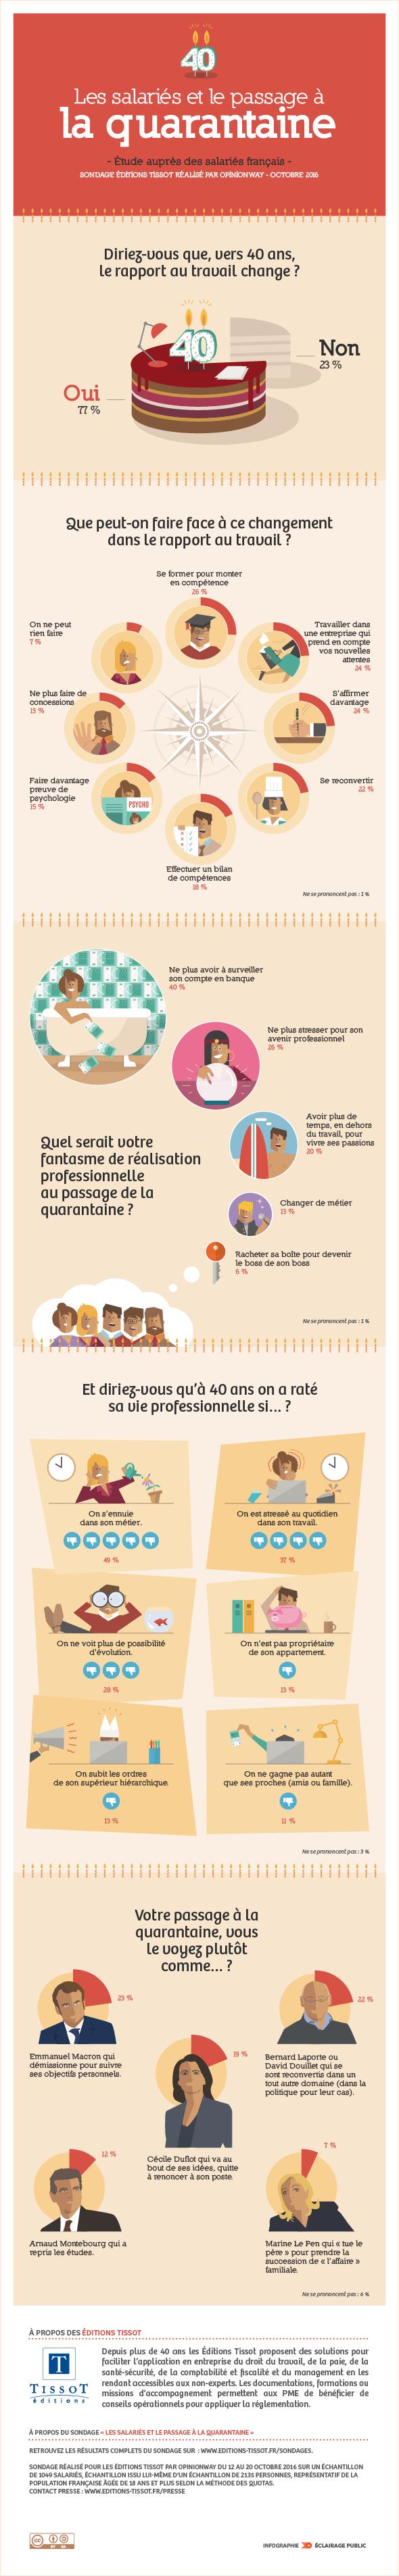 infographie-sondage-crise-quarantaine-tissot-590